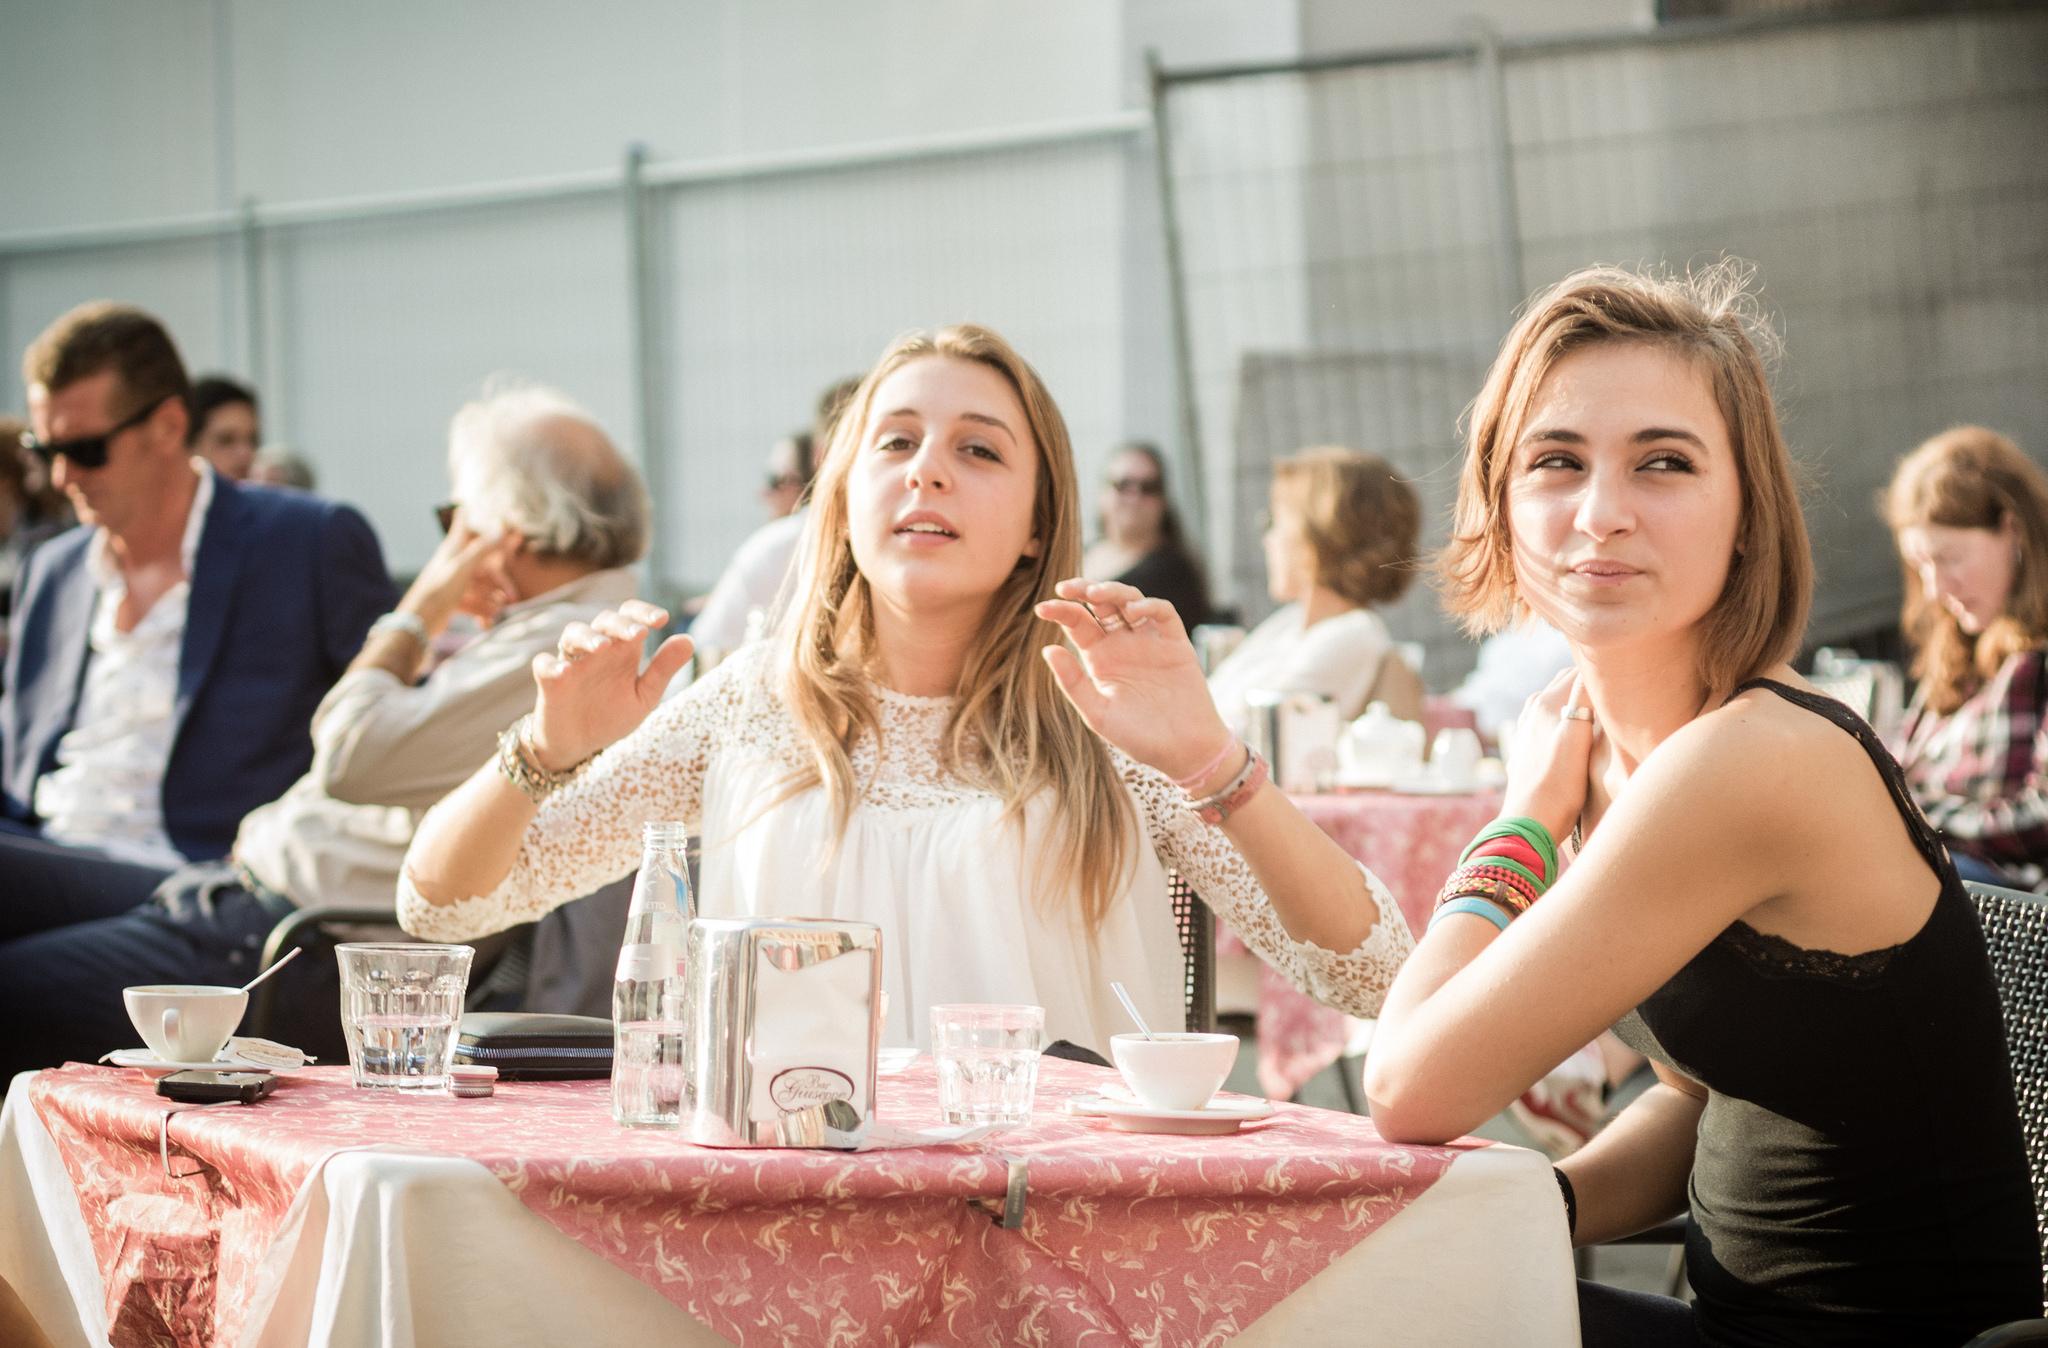 garotas conversando